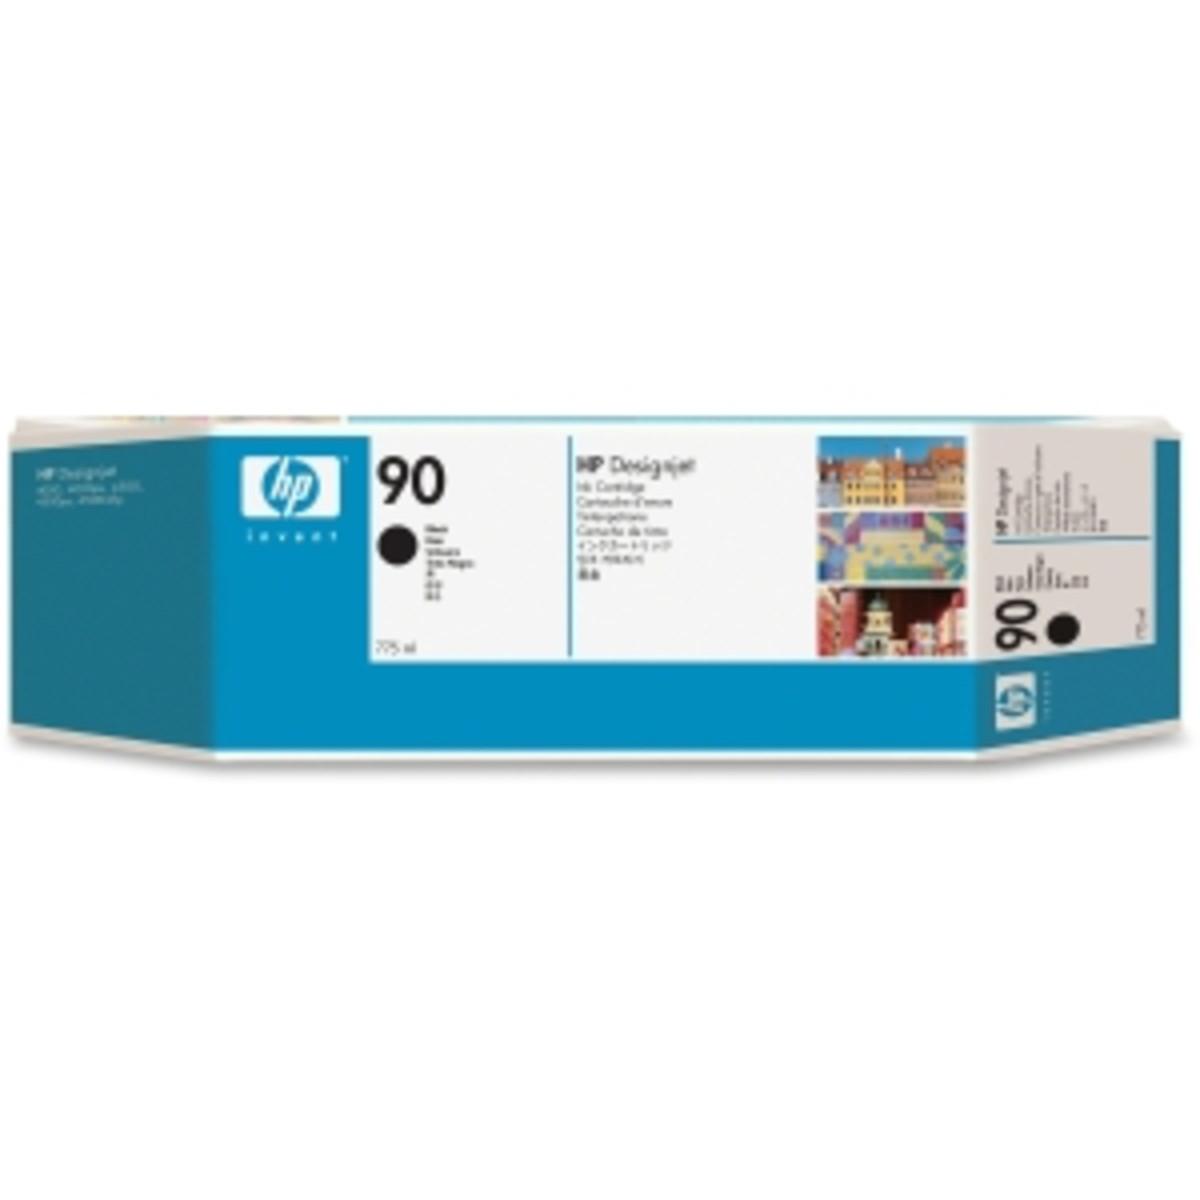 HP 90 (C5058A) Black Ink Cartridge